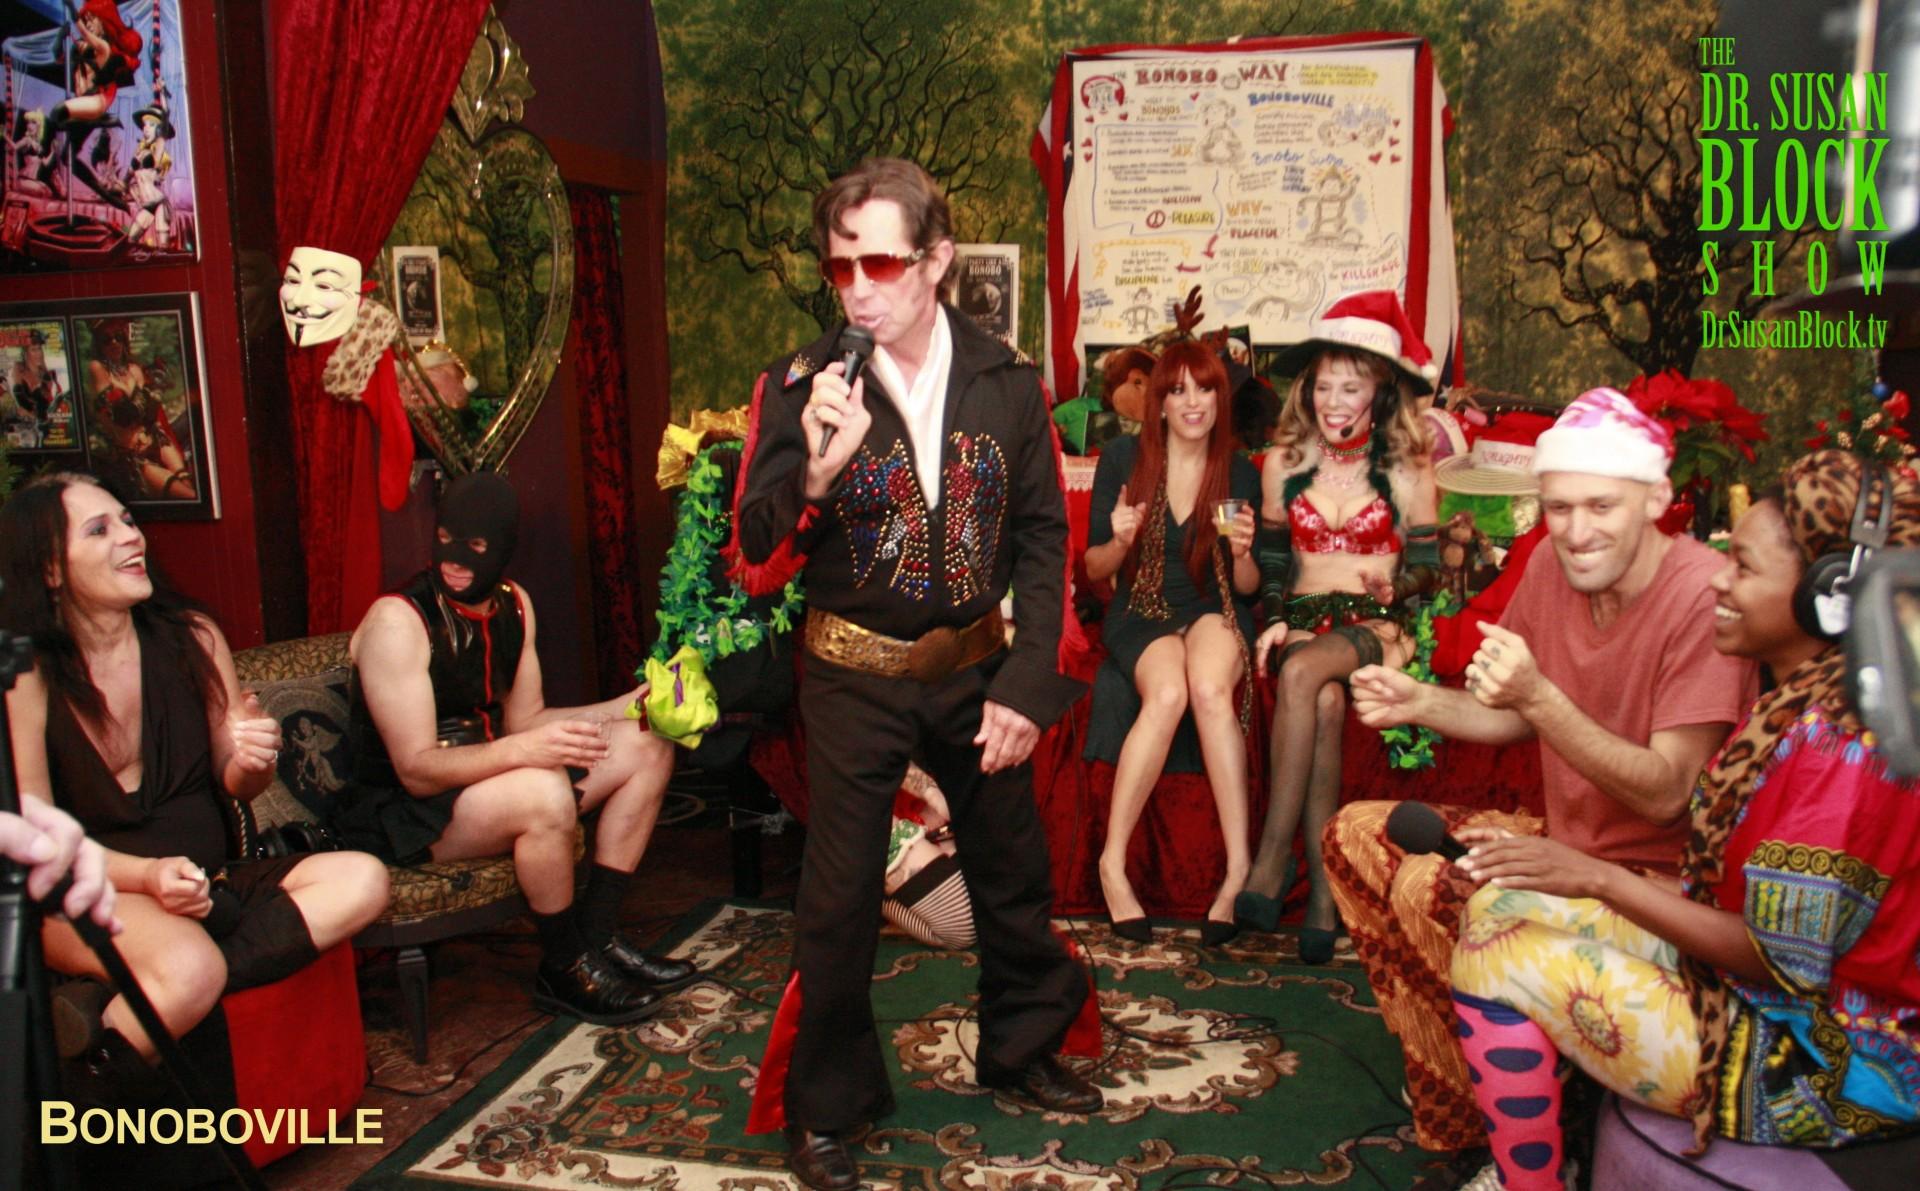 Naughty Footsie Solstice with Elvis + Birthday Madam RavenRae, the Bonobo Way!